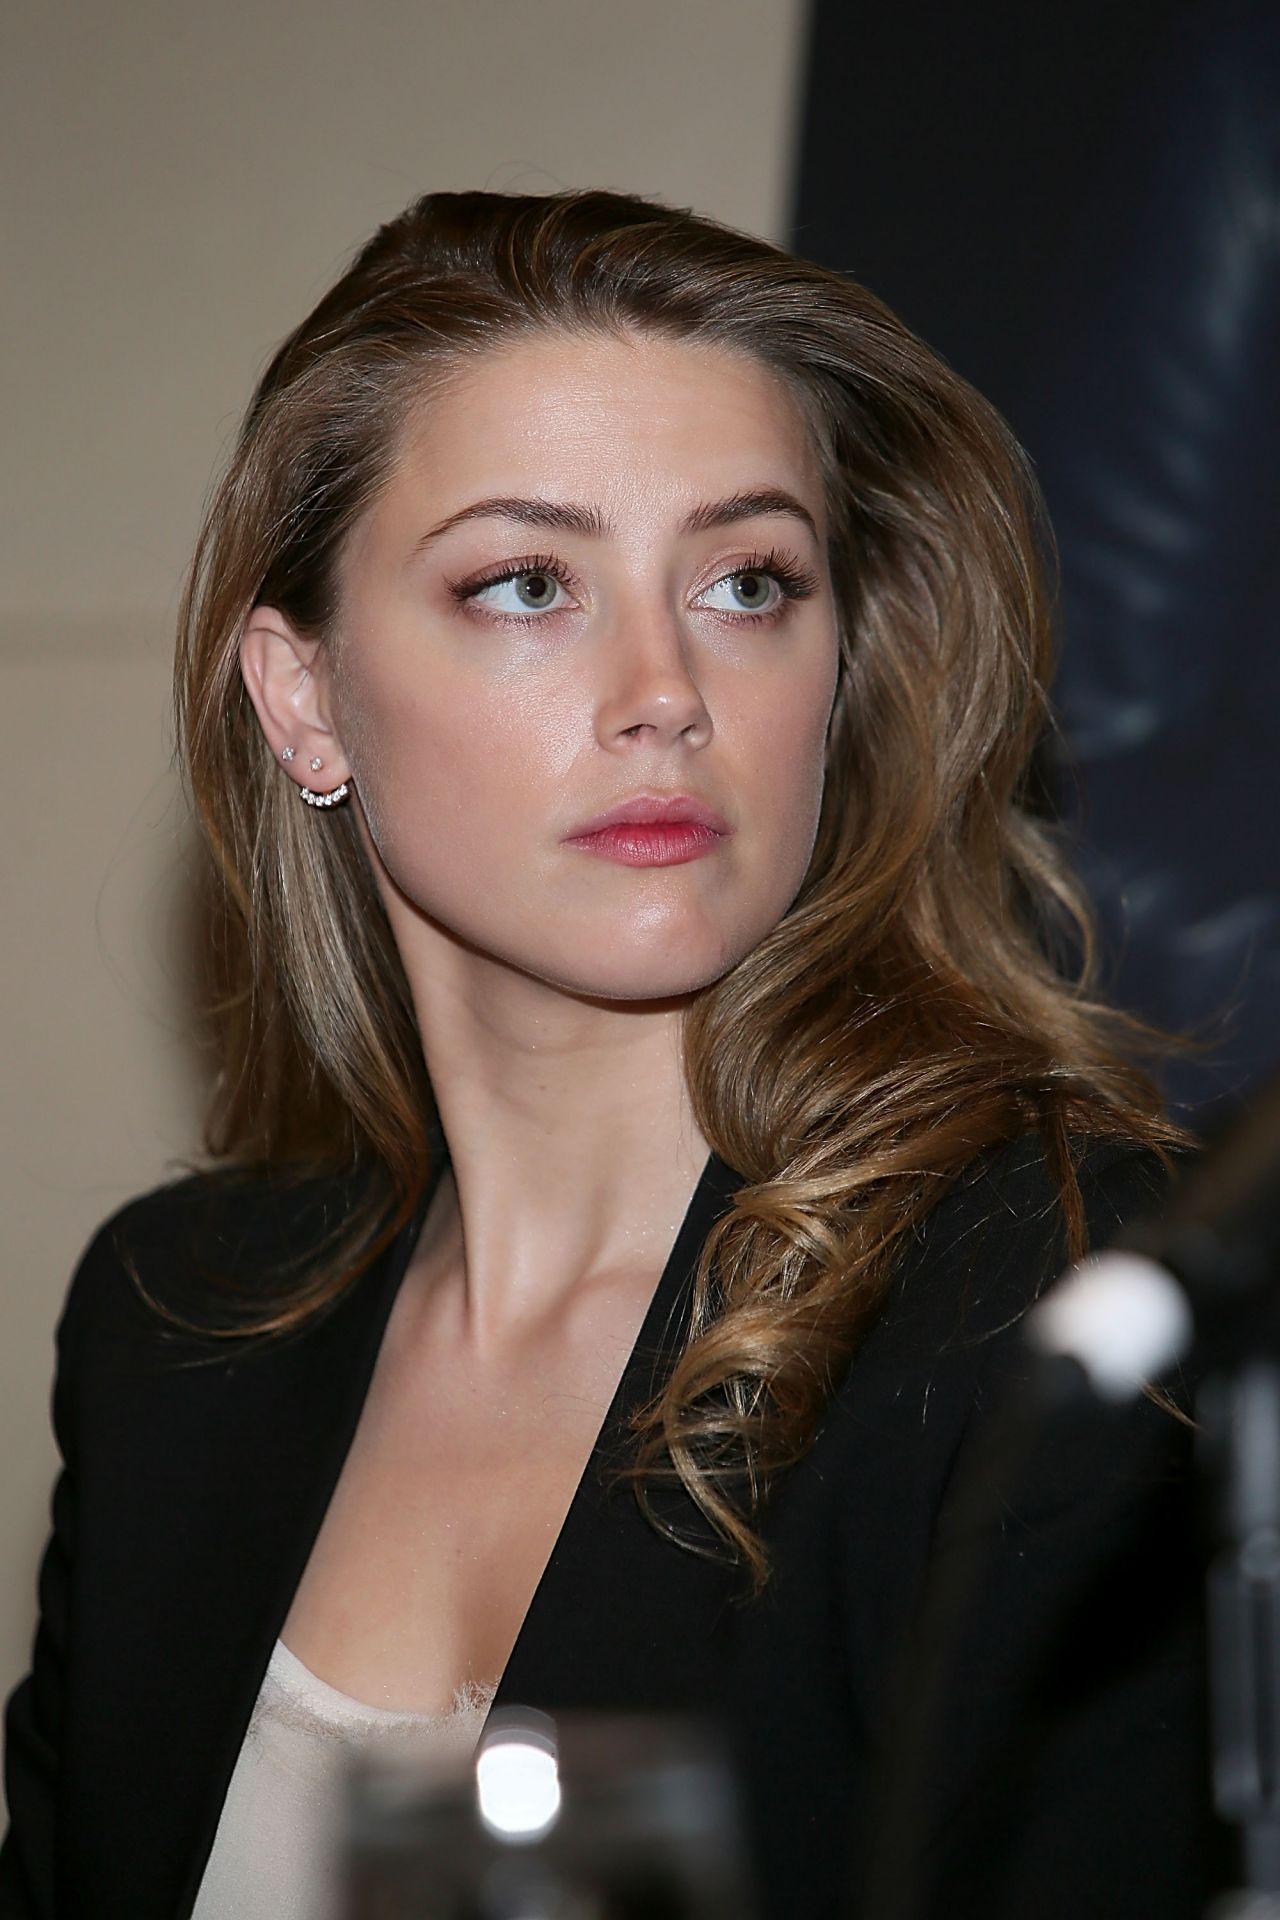 Amber Heard 2014 Texas Film Awards Press Conference